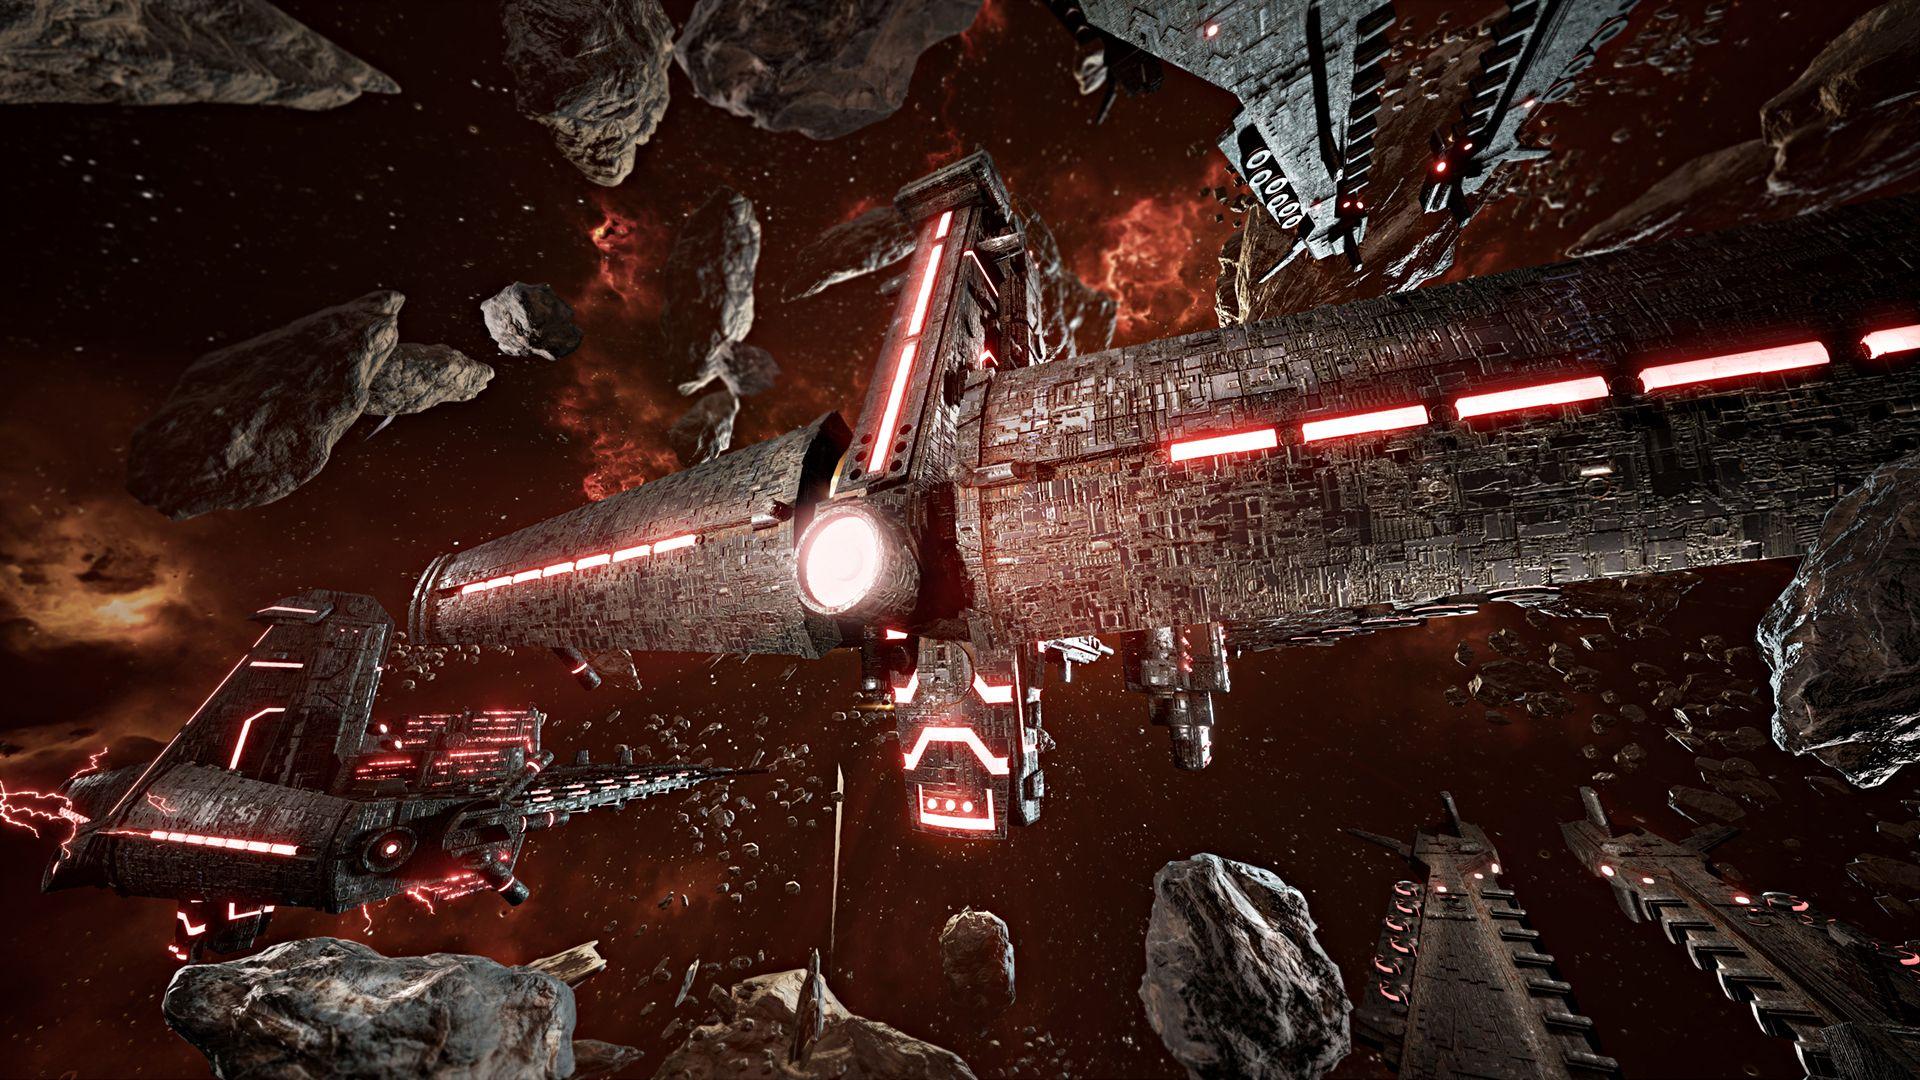 [MULTI] Battlefleet Gothic Armada Tau Empire-SKIDROW